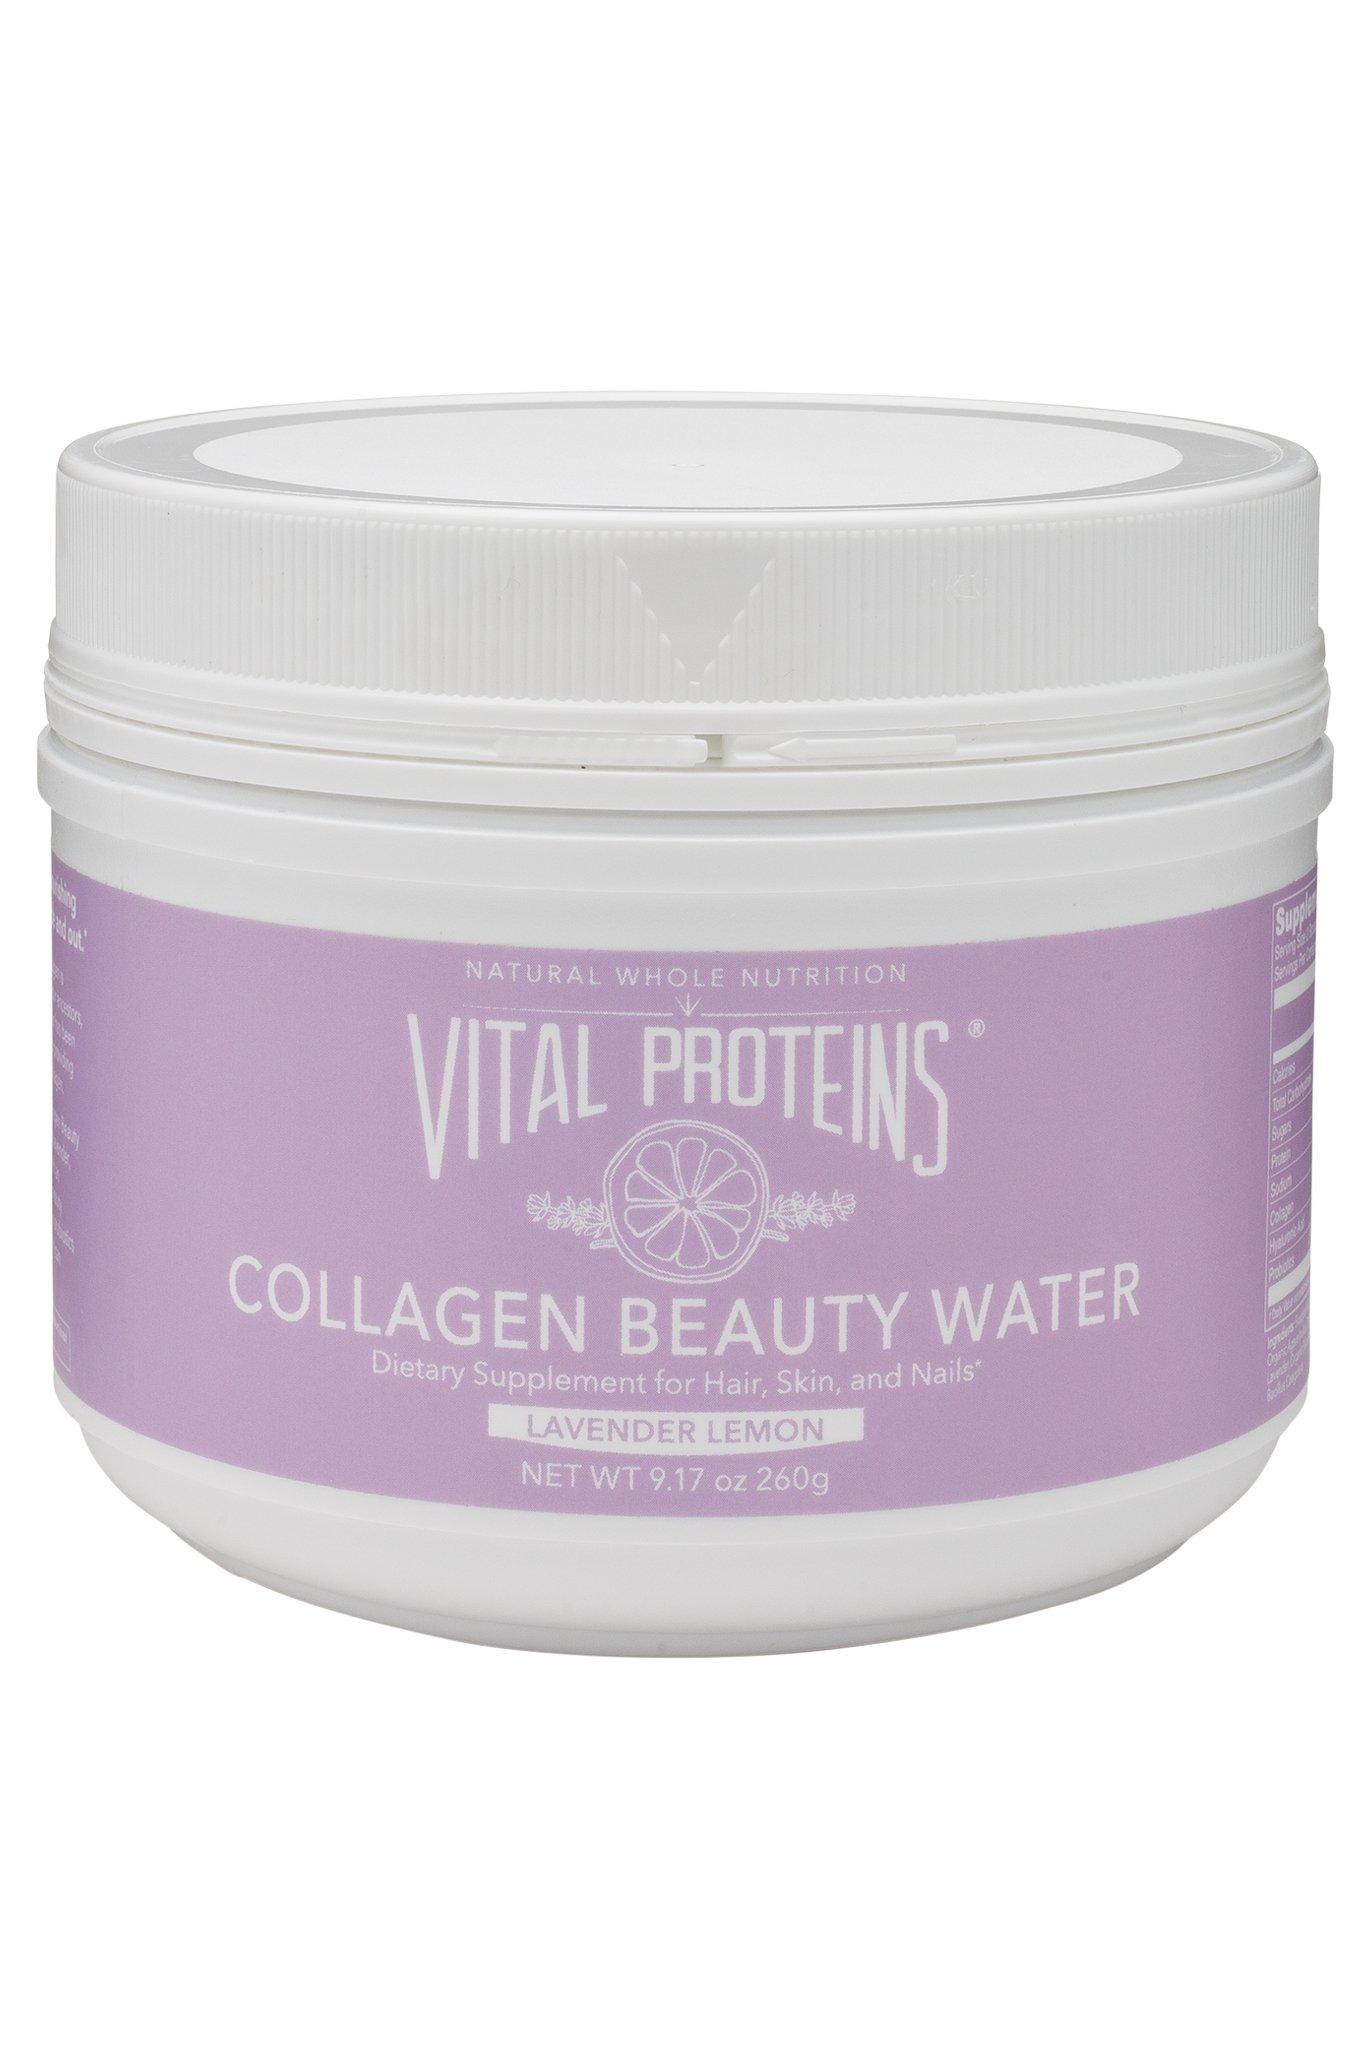 Vital Proteins Collagen Beauty Water (Lavender Lemon, 9 oz)